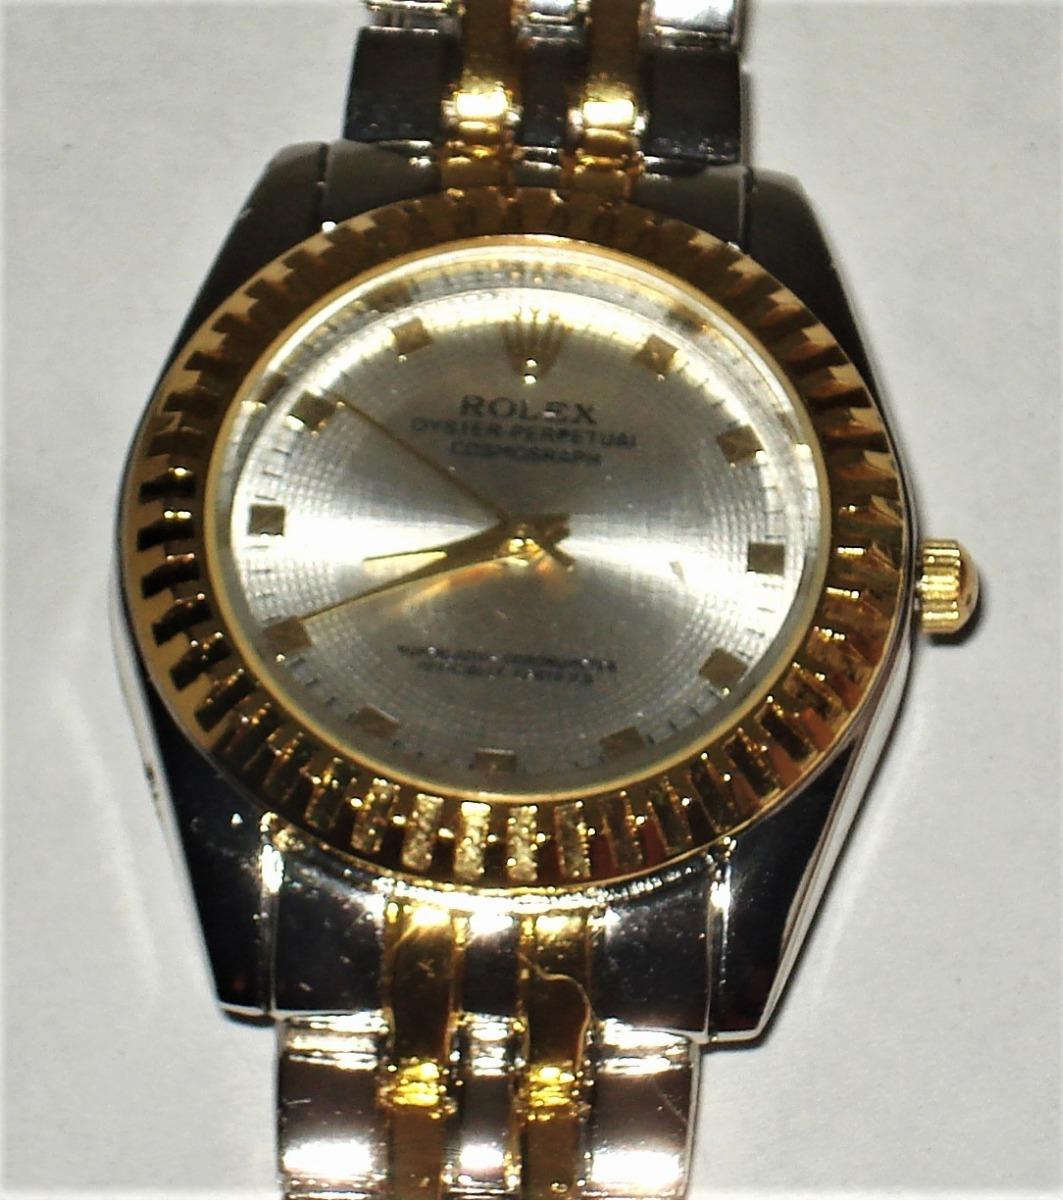 Simil Reloj Dama Simil Pulsera Pulsera Reloj Rolex Pulsera Simil Rolex Reloj Dama thrdCxsQ